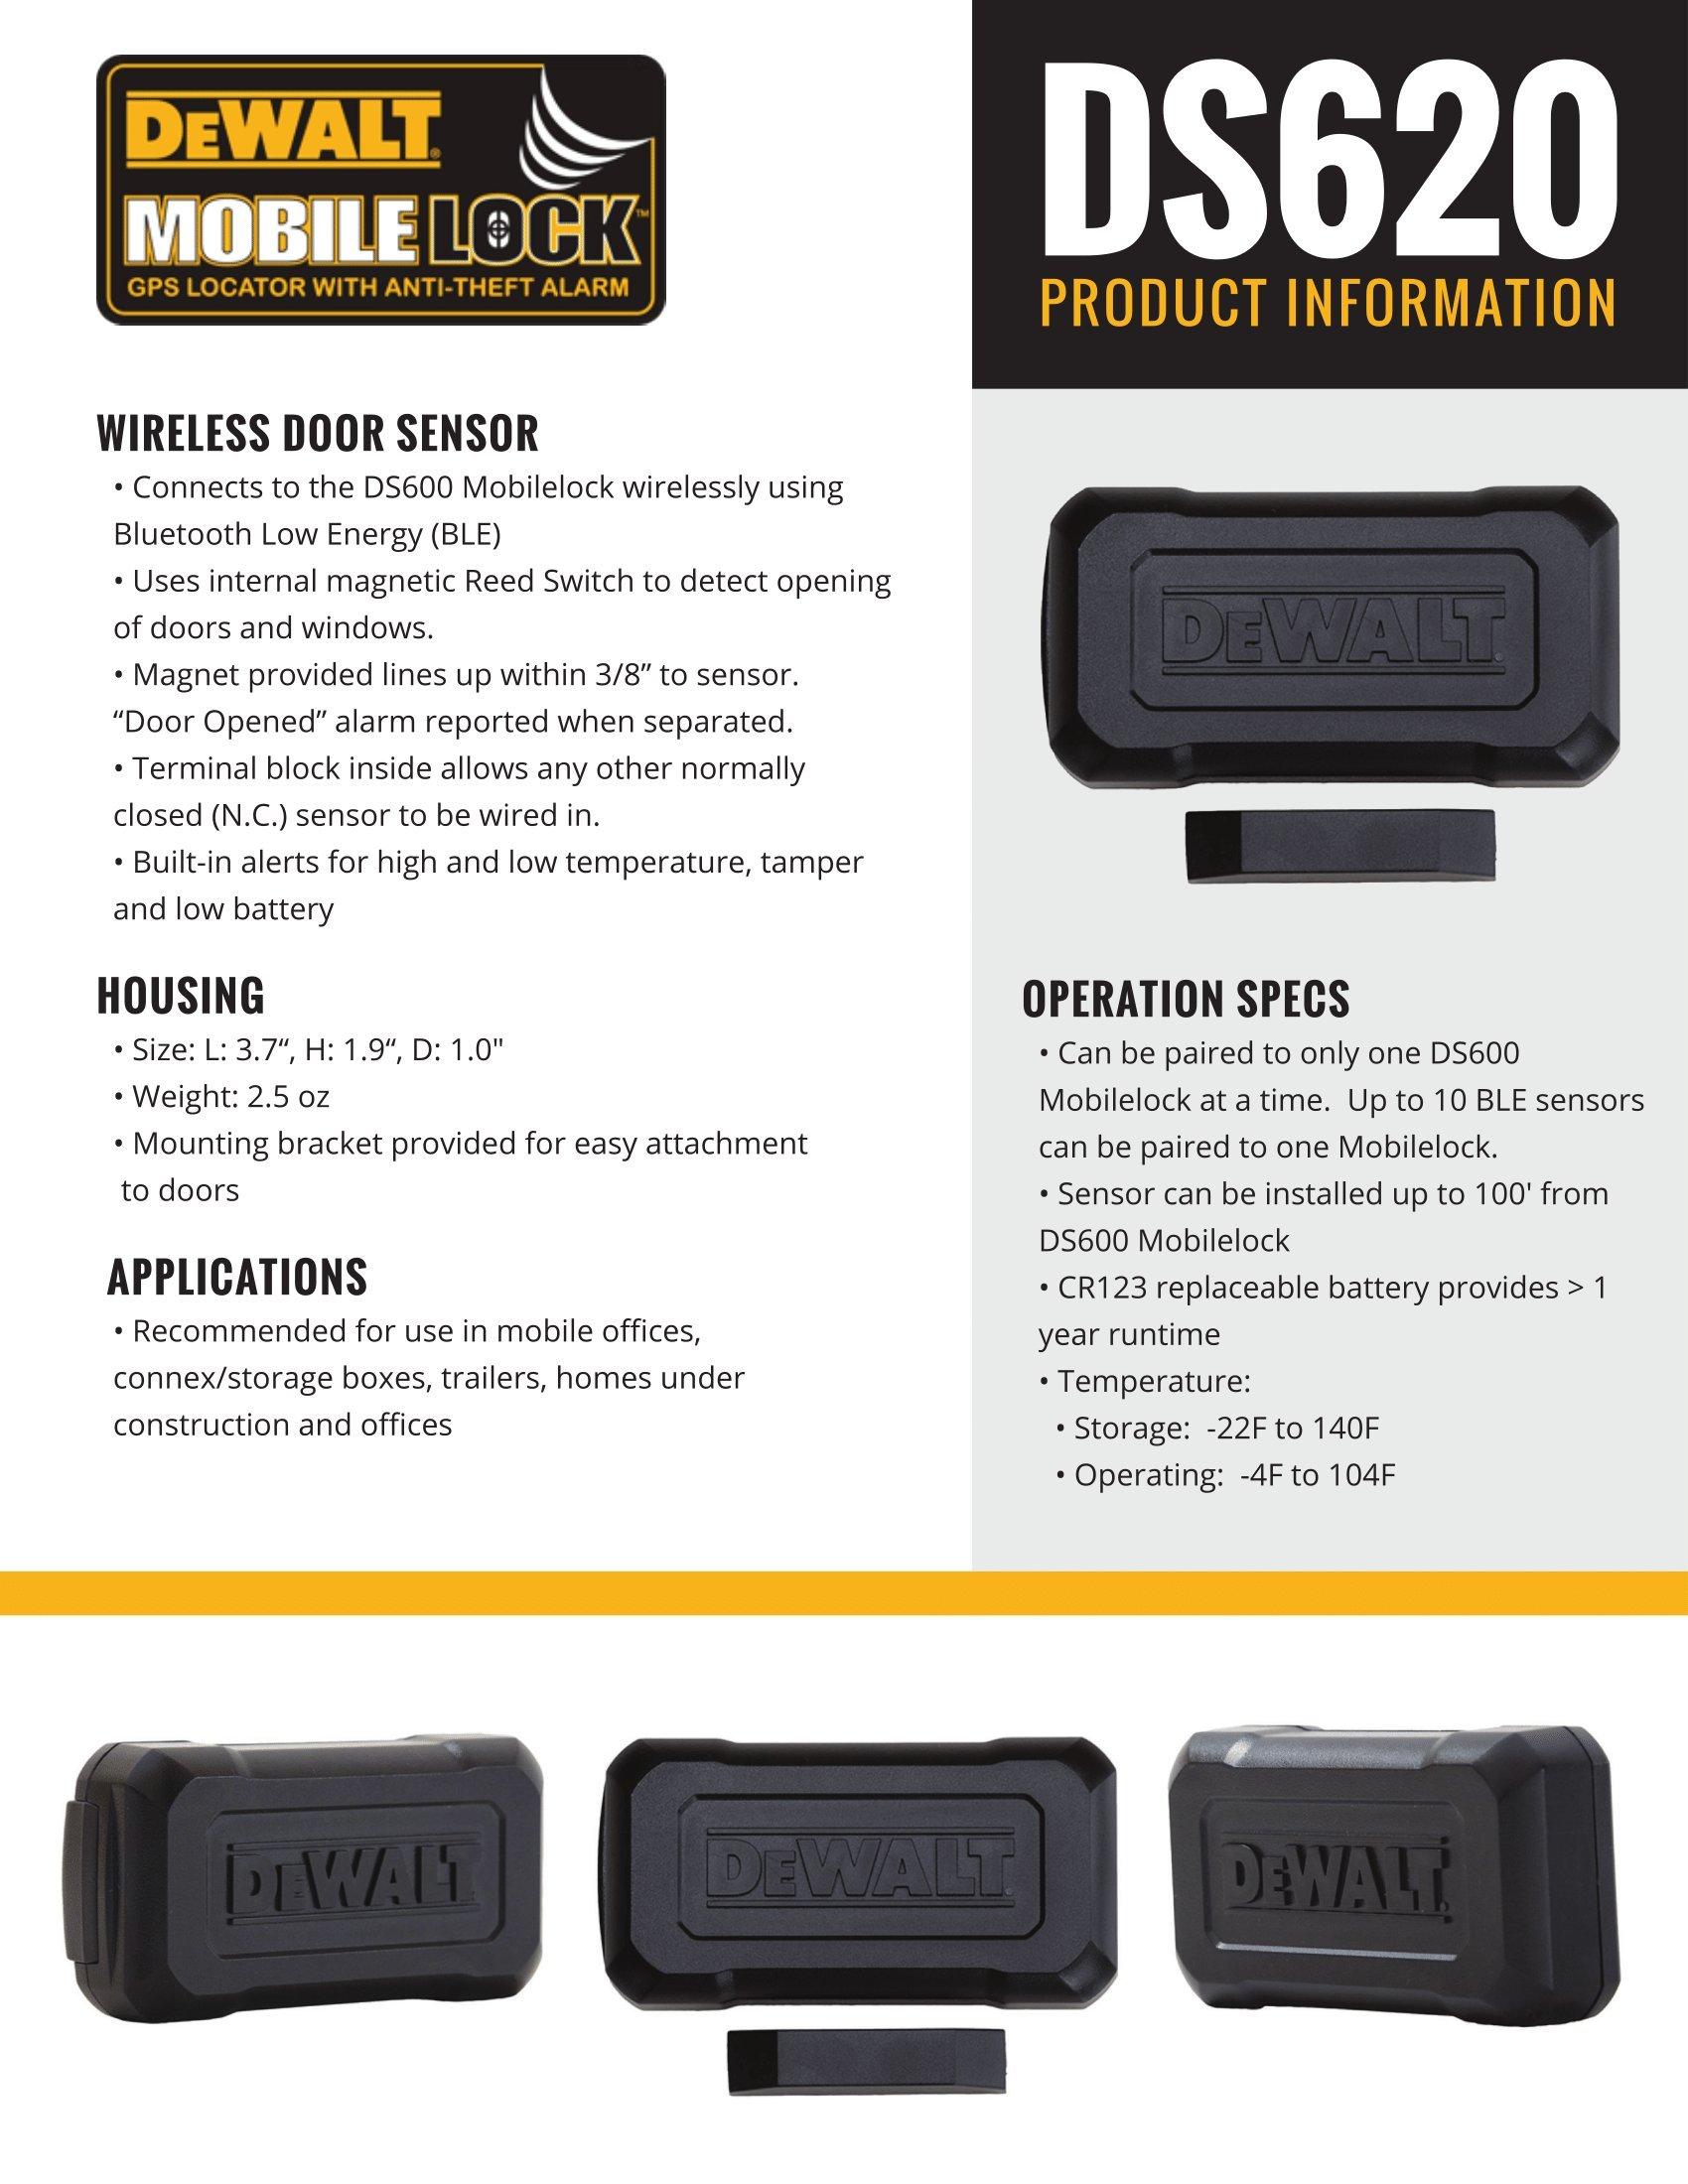 DS620 Wireless Door Sensor (works only with DS600)